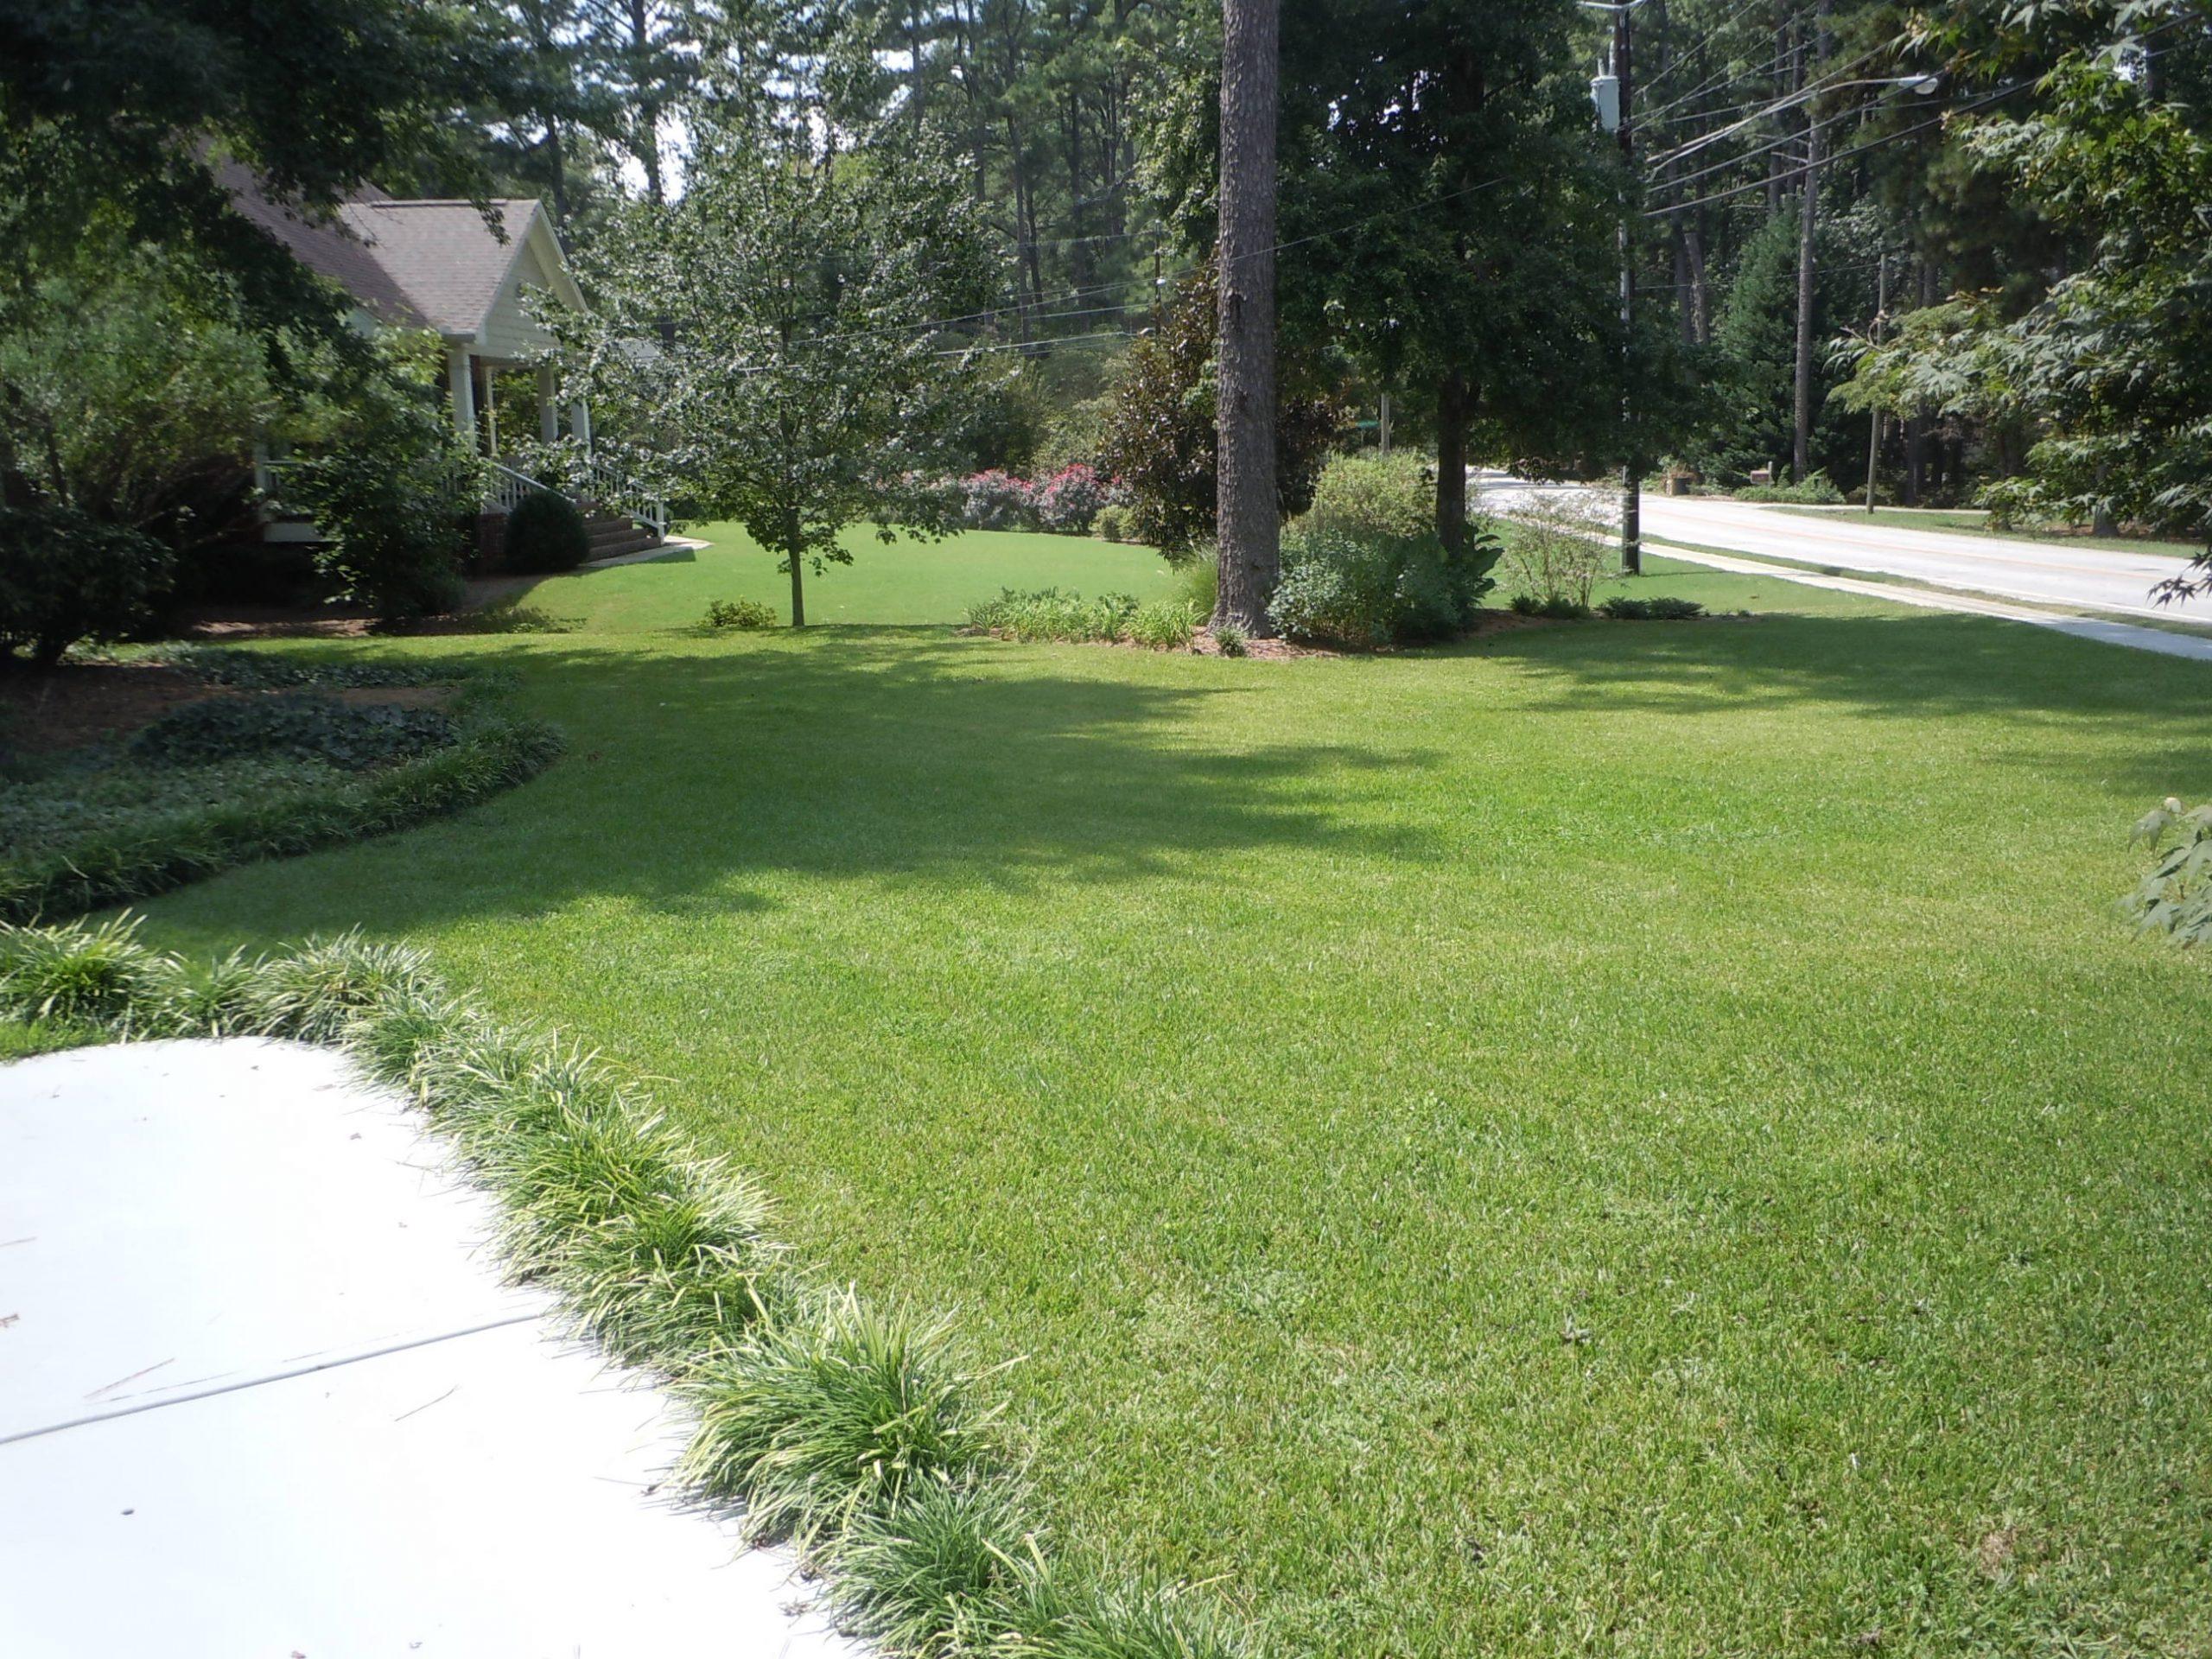 St. Augustinegrass in summer